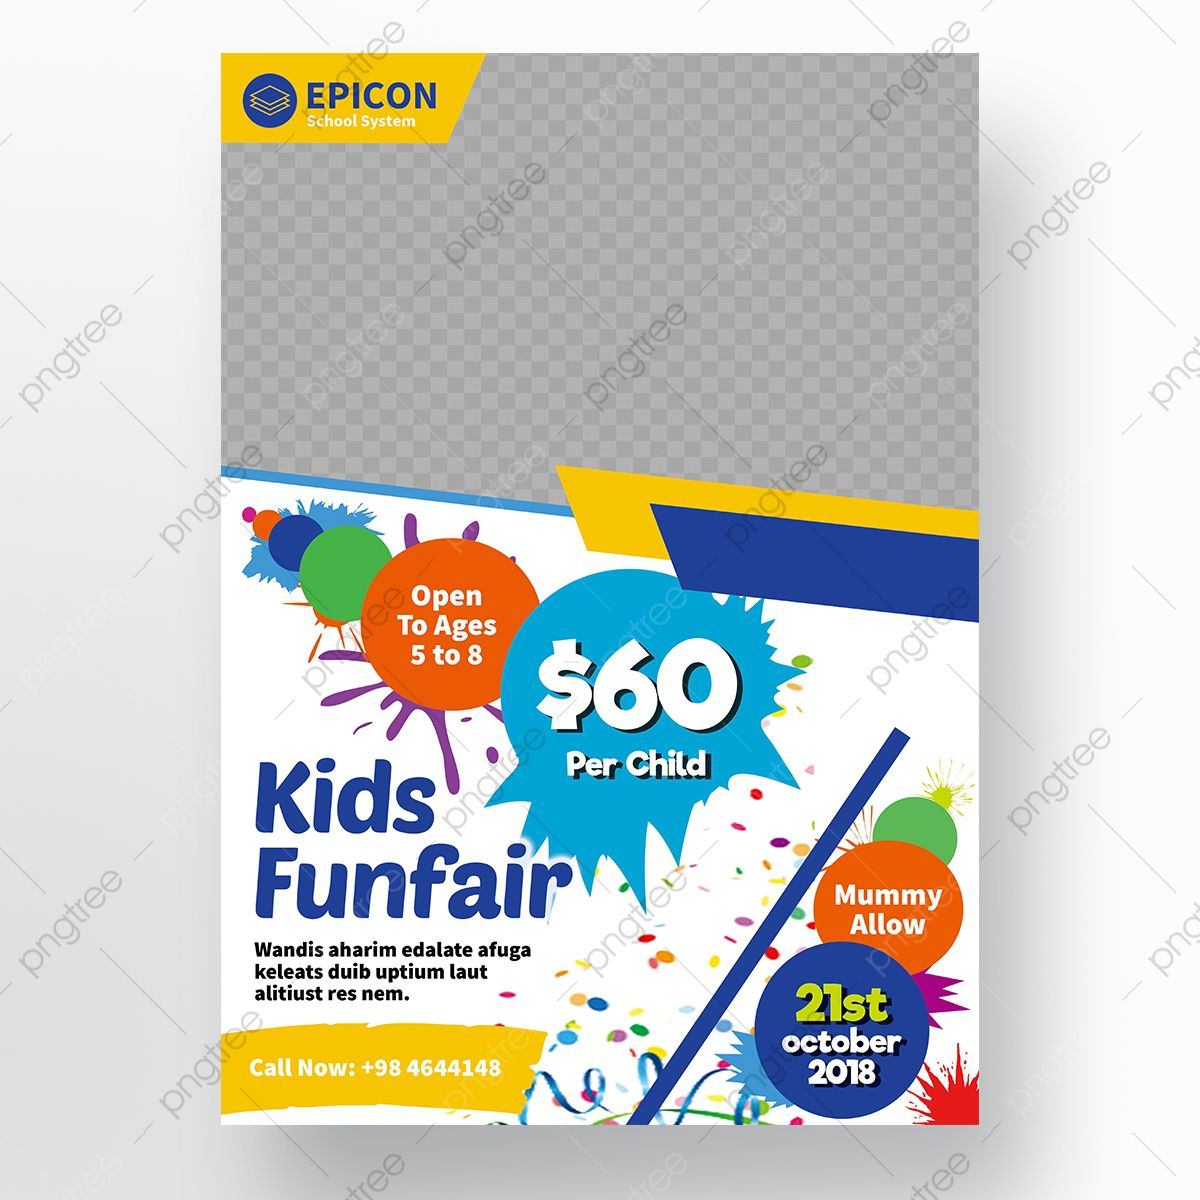 006 Wondrou Free School Flyer Design Template Highest Clarity  Templates Creative Education PosterFull